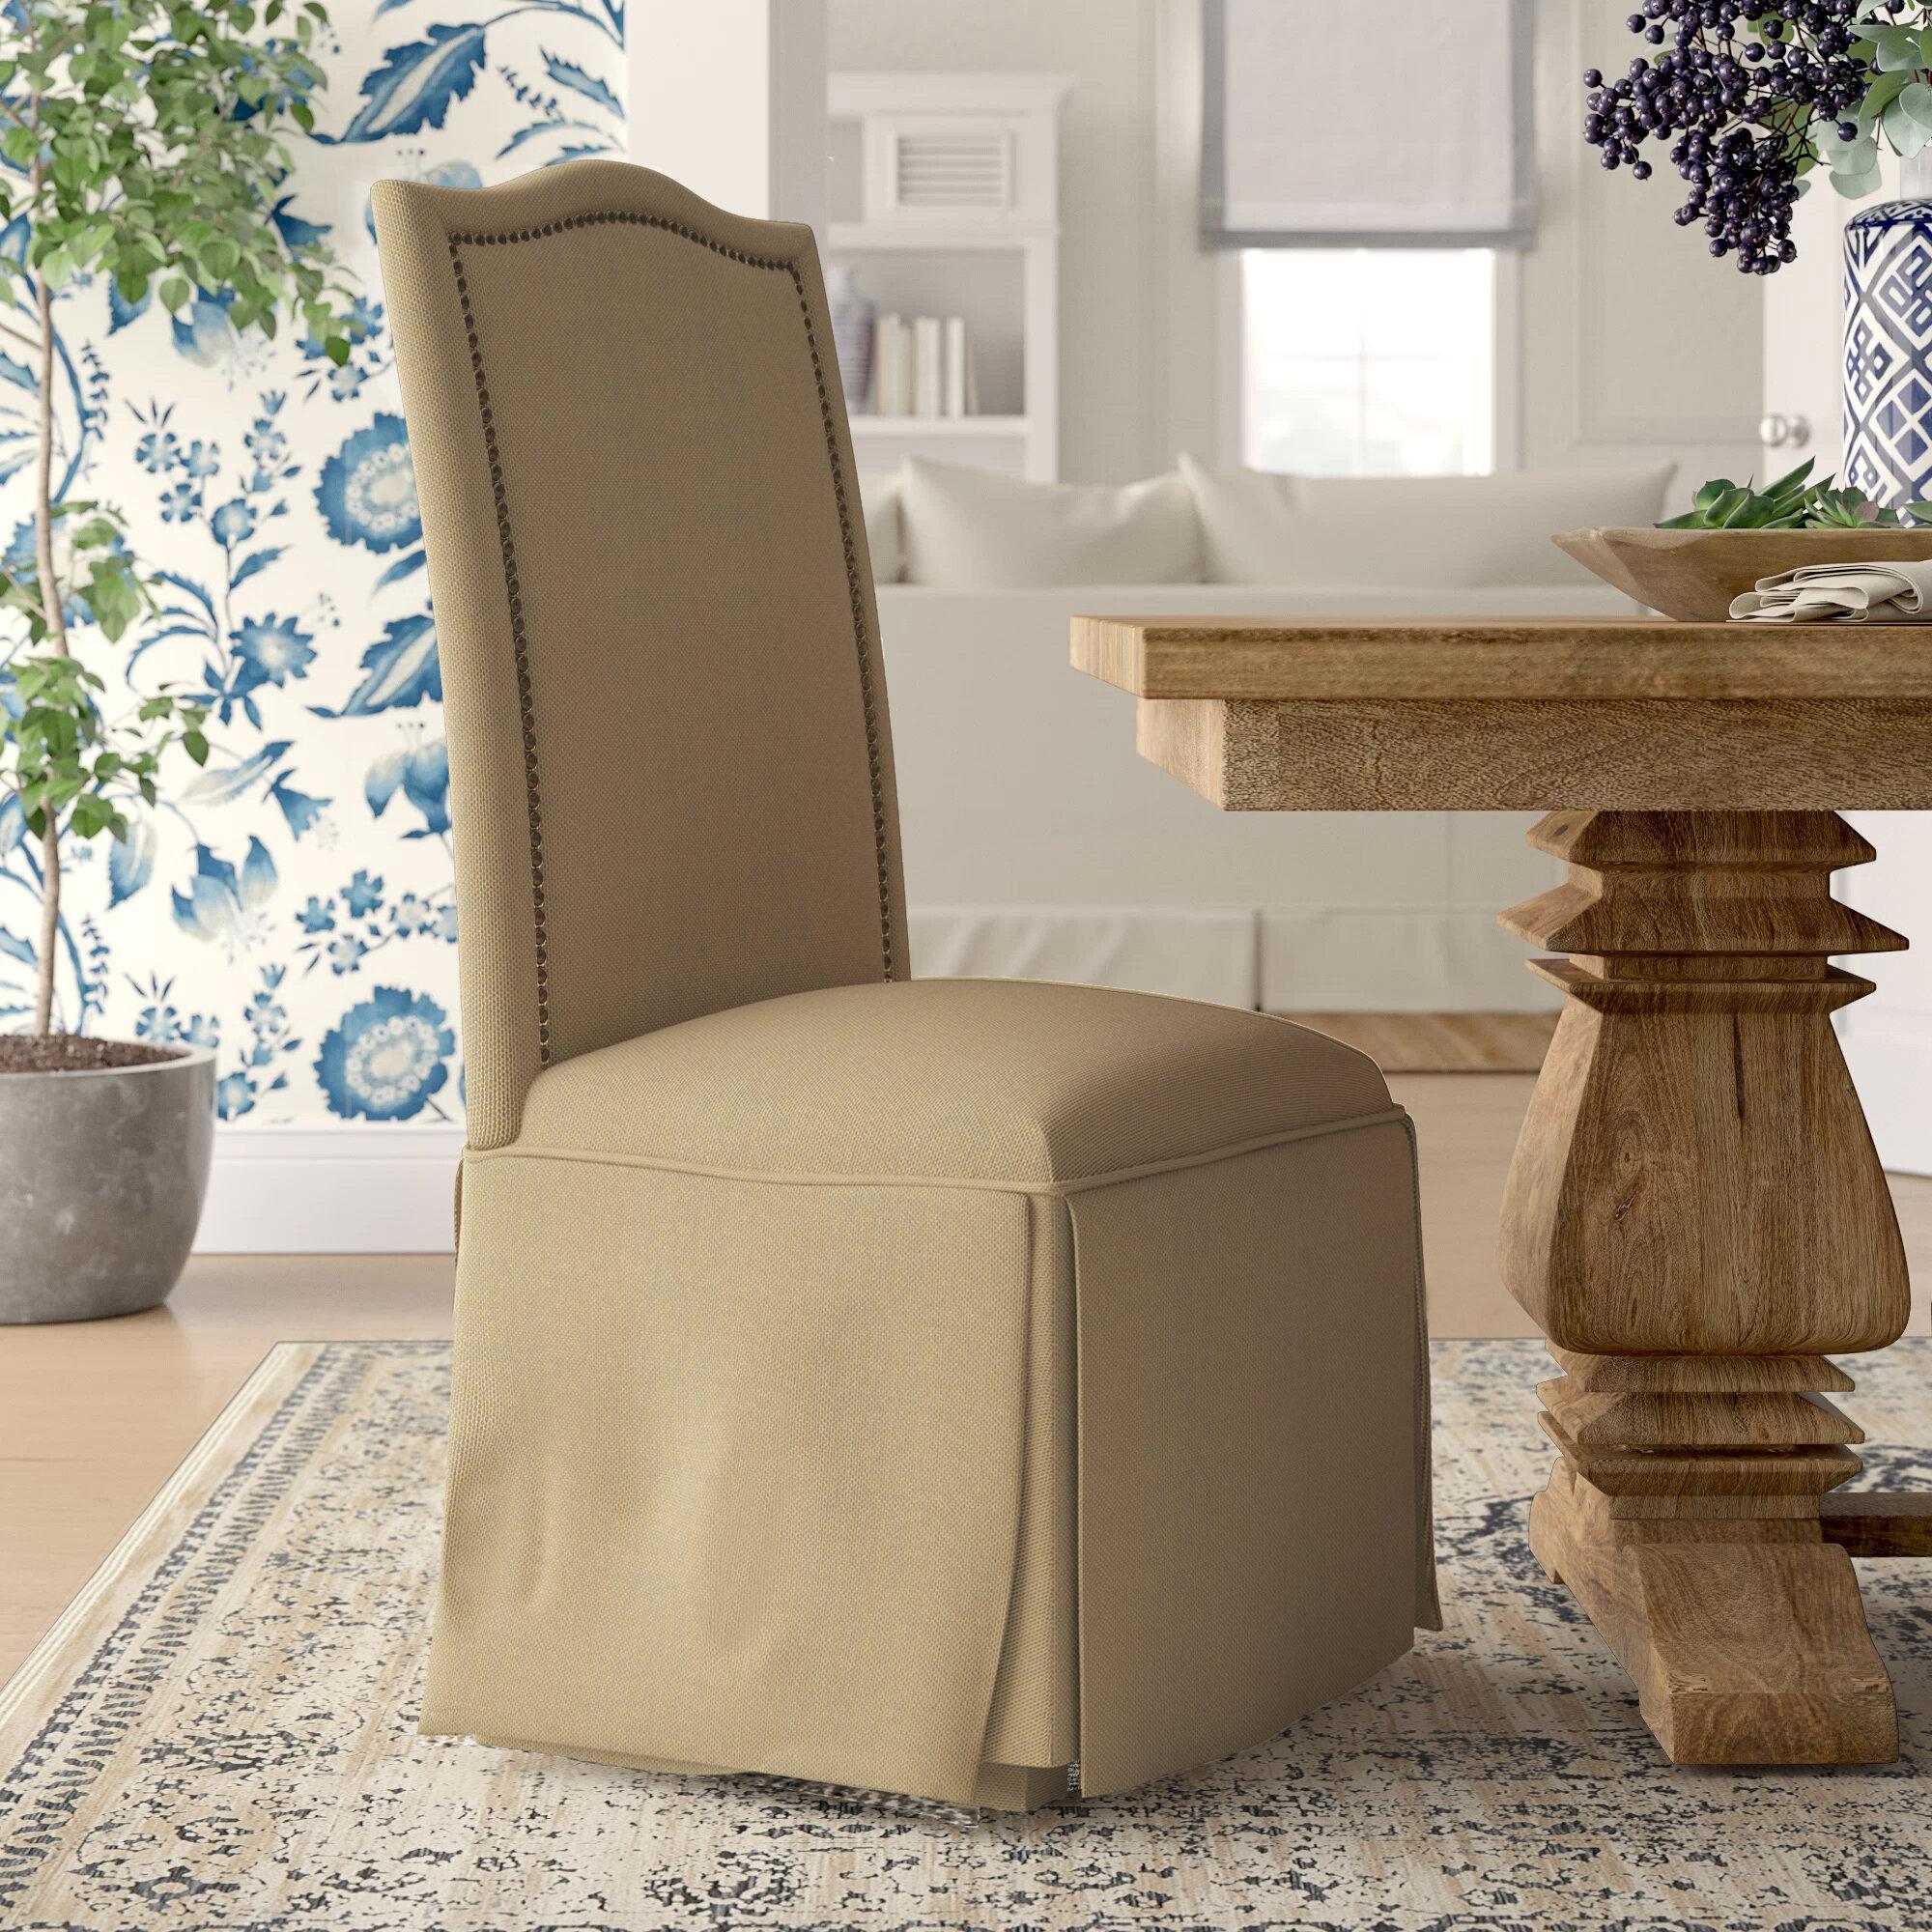 Groovy Alison Skirted Upholstered Parson Chair Pdpeps Interior Chair Design Pdpepsorg